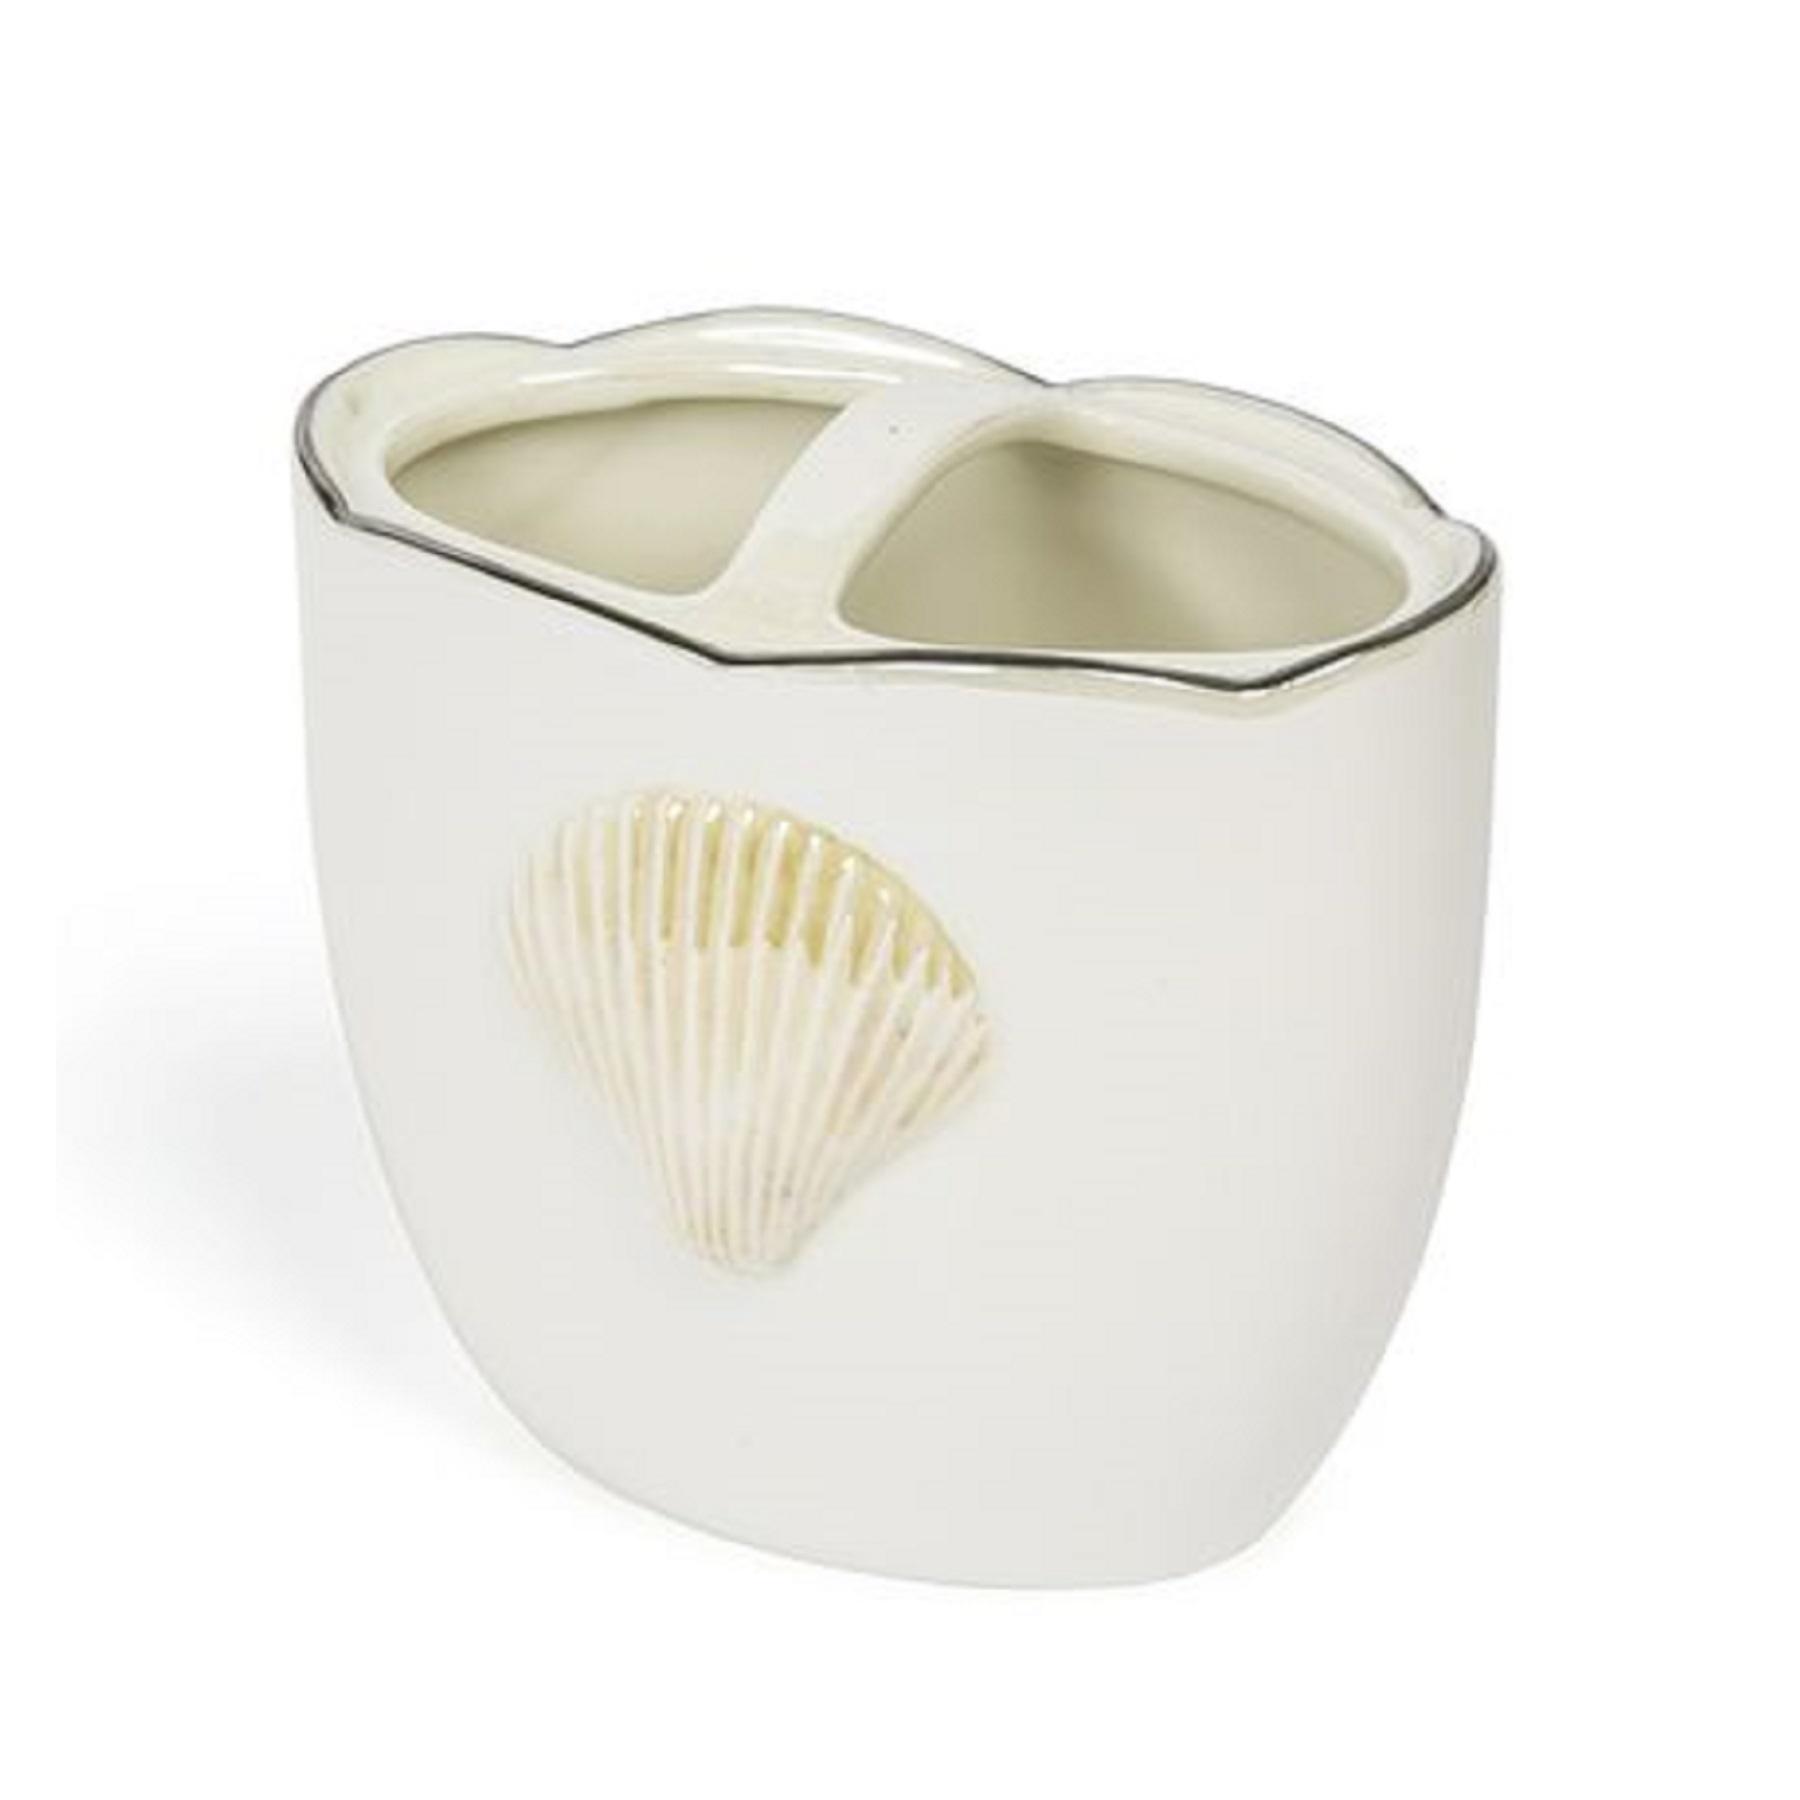 Стаканы для щеток Стакан для зубных щёток Kassatex Mare Shells Pearl stakan-dlya-zubnih-shyotok-mare-shells-pearl-ot-kassatex-ssha-kitay-vid-sboku.jpg